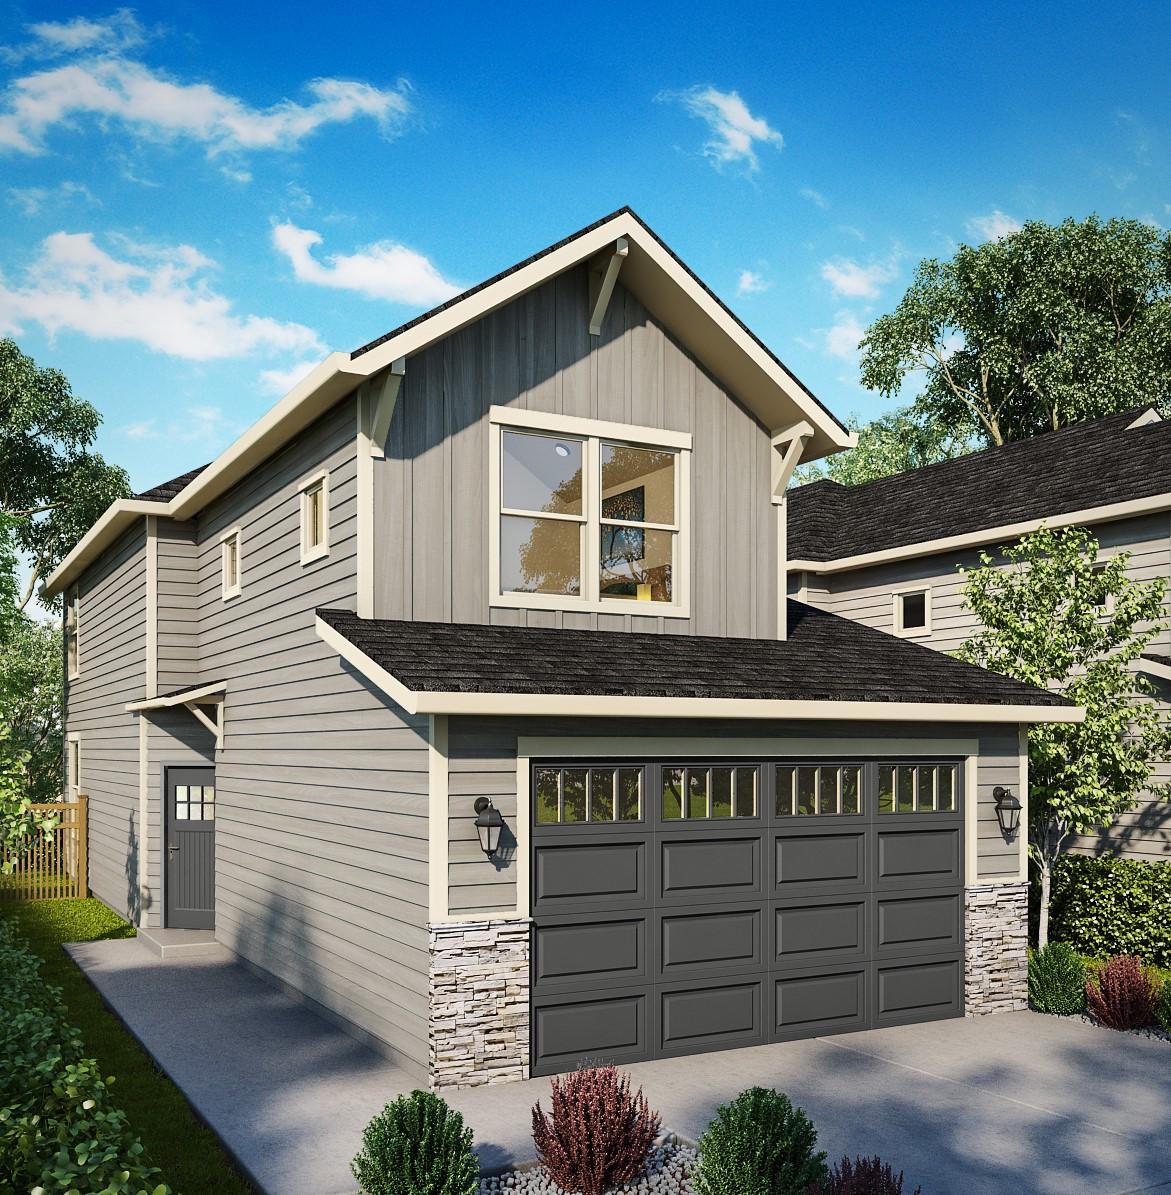 Spm Property Management Highland Manor: 4530-HiddenVista22ColorDraft07 (1)